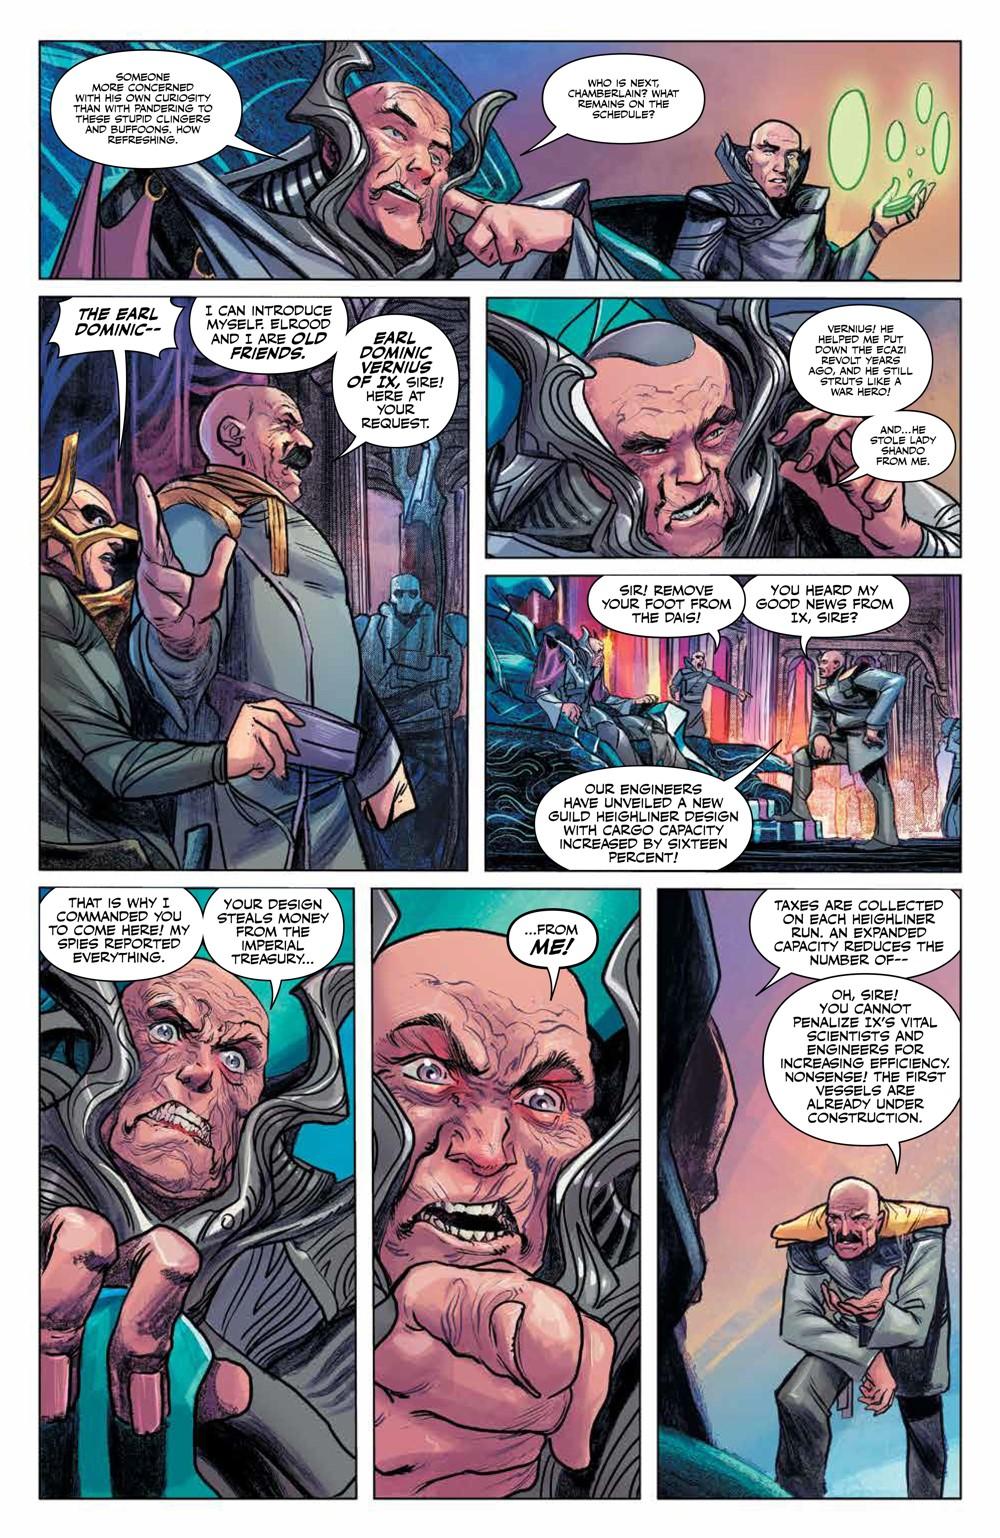 Dune_HouseAtreides_v1_HC_PRESS_17 ComicList Previews: DUNE HOUSE ATREIDES VOLUME 1 HC